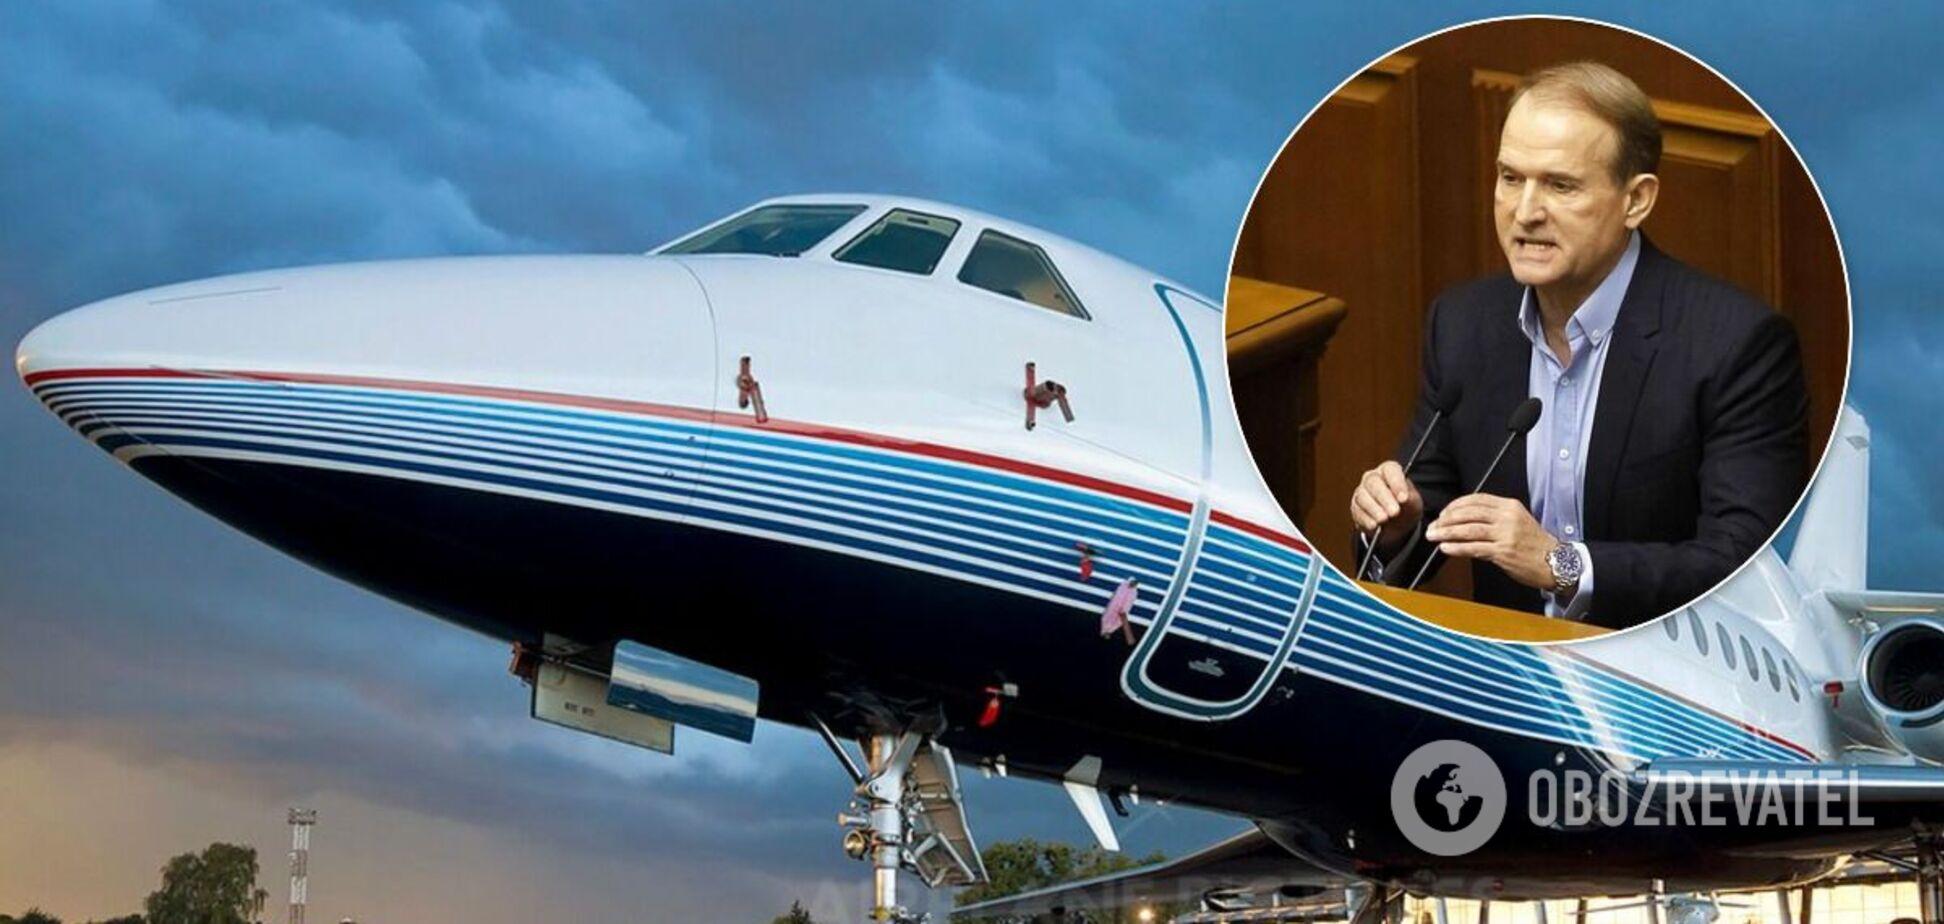 На самолеты Медведчука и Козака наложили санкции